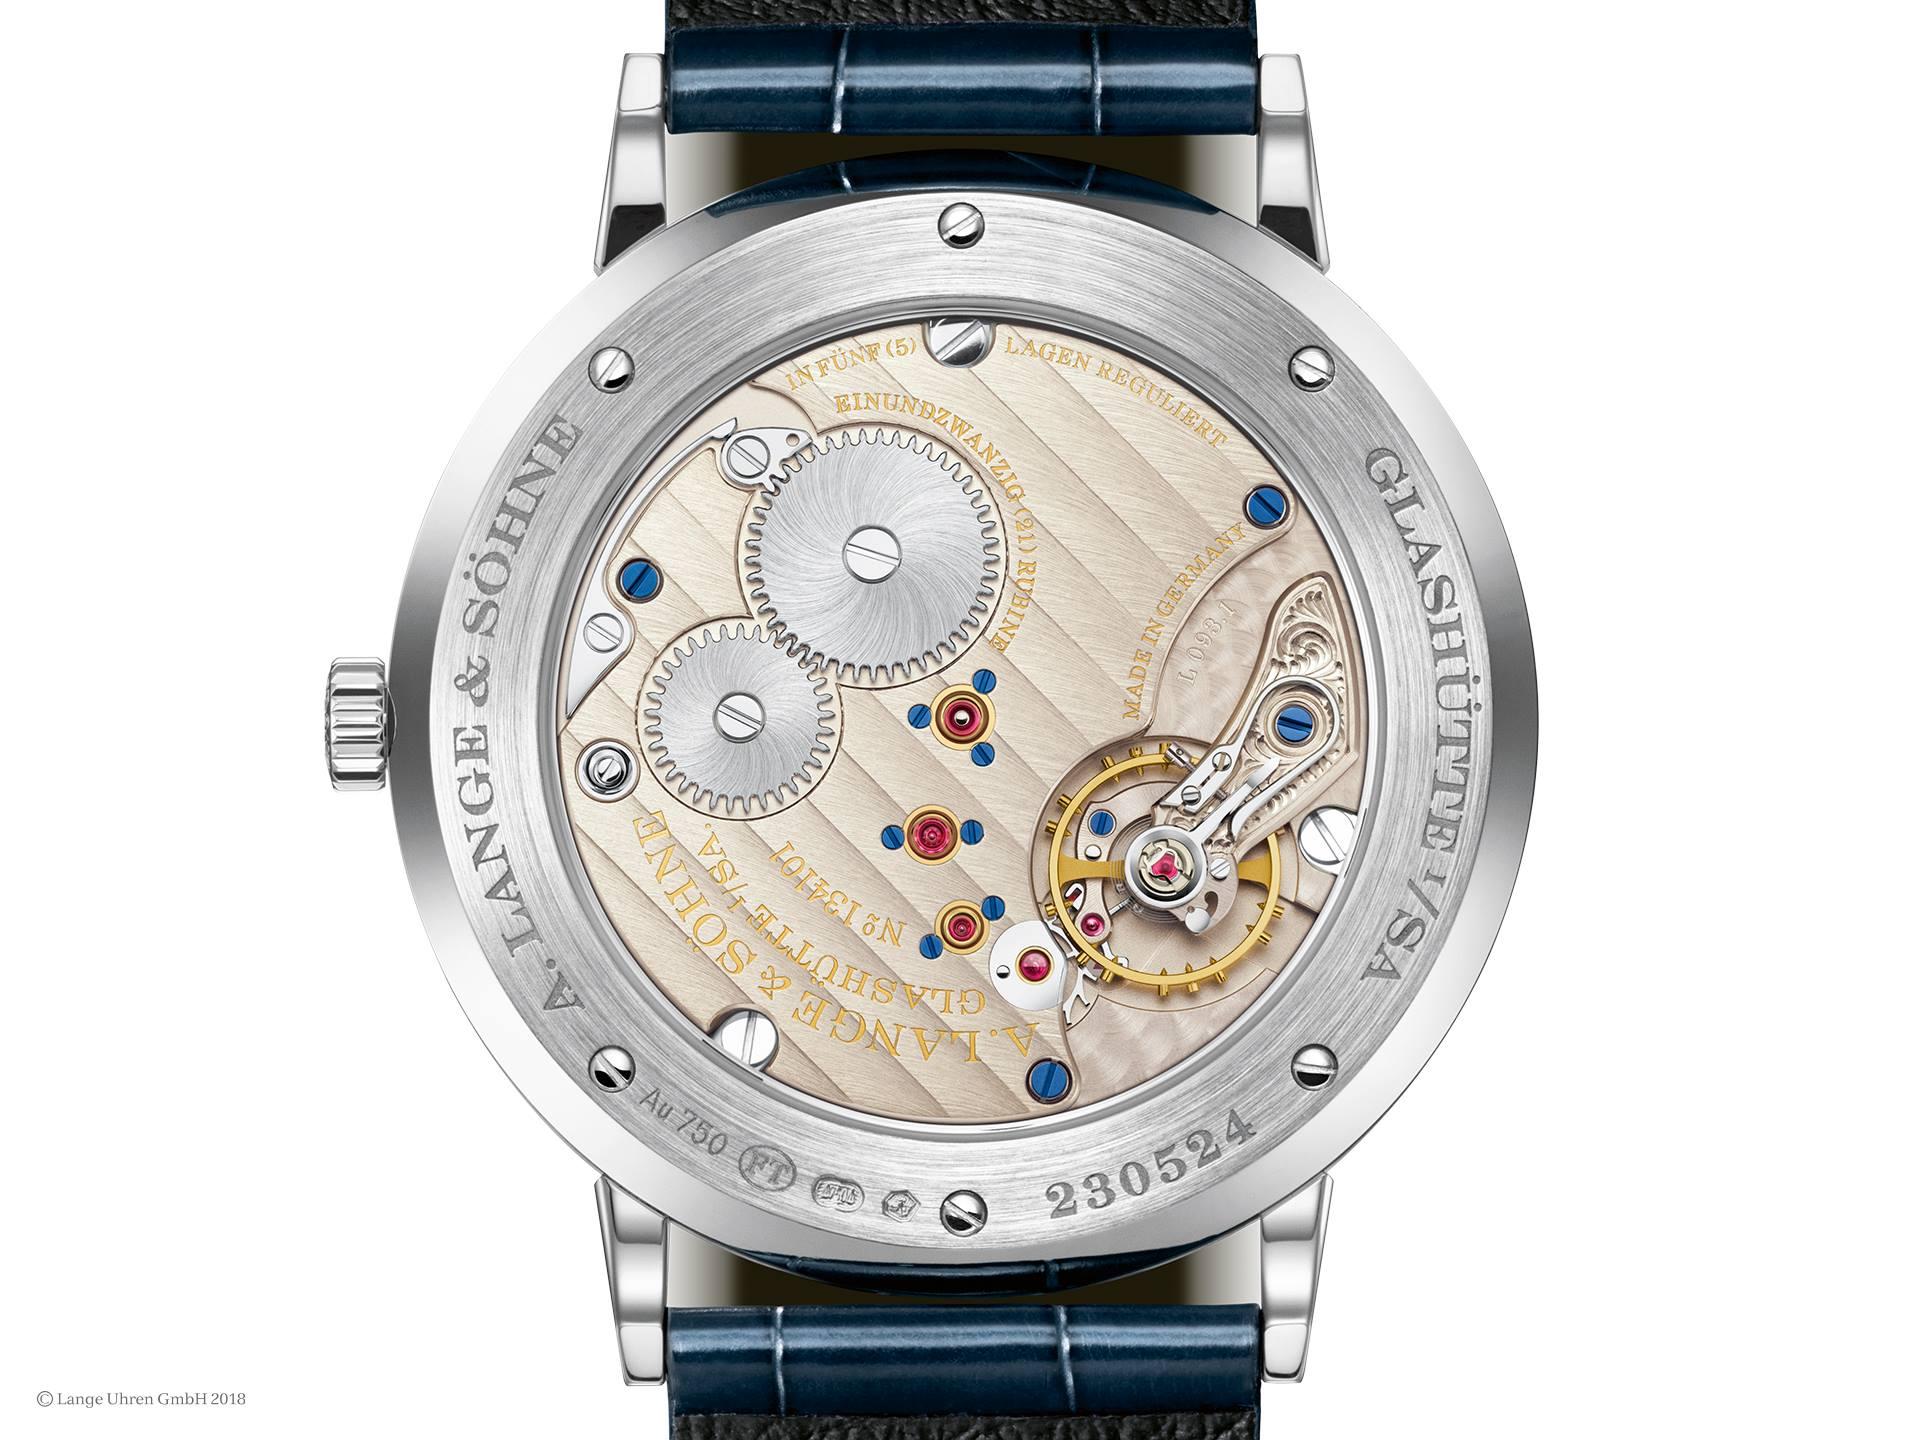 a lange söhne saxonia thin aventurine blue dial white gold caliber l093.1 review